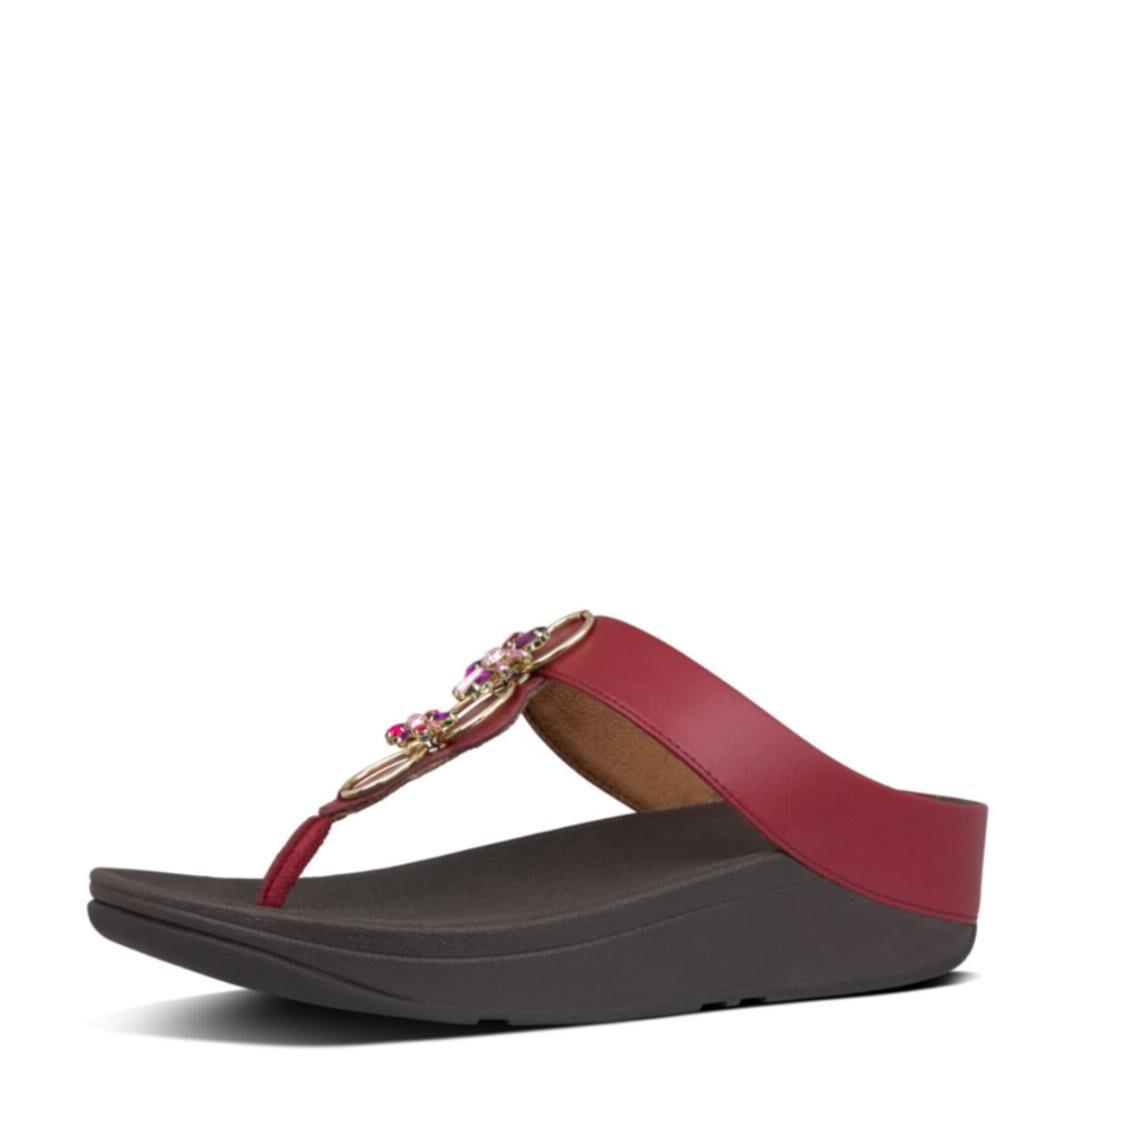 Fitflop Fino Blossom Toe Thongs Dark Red Y08-738